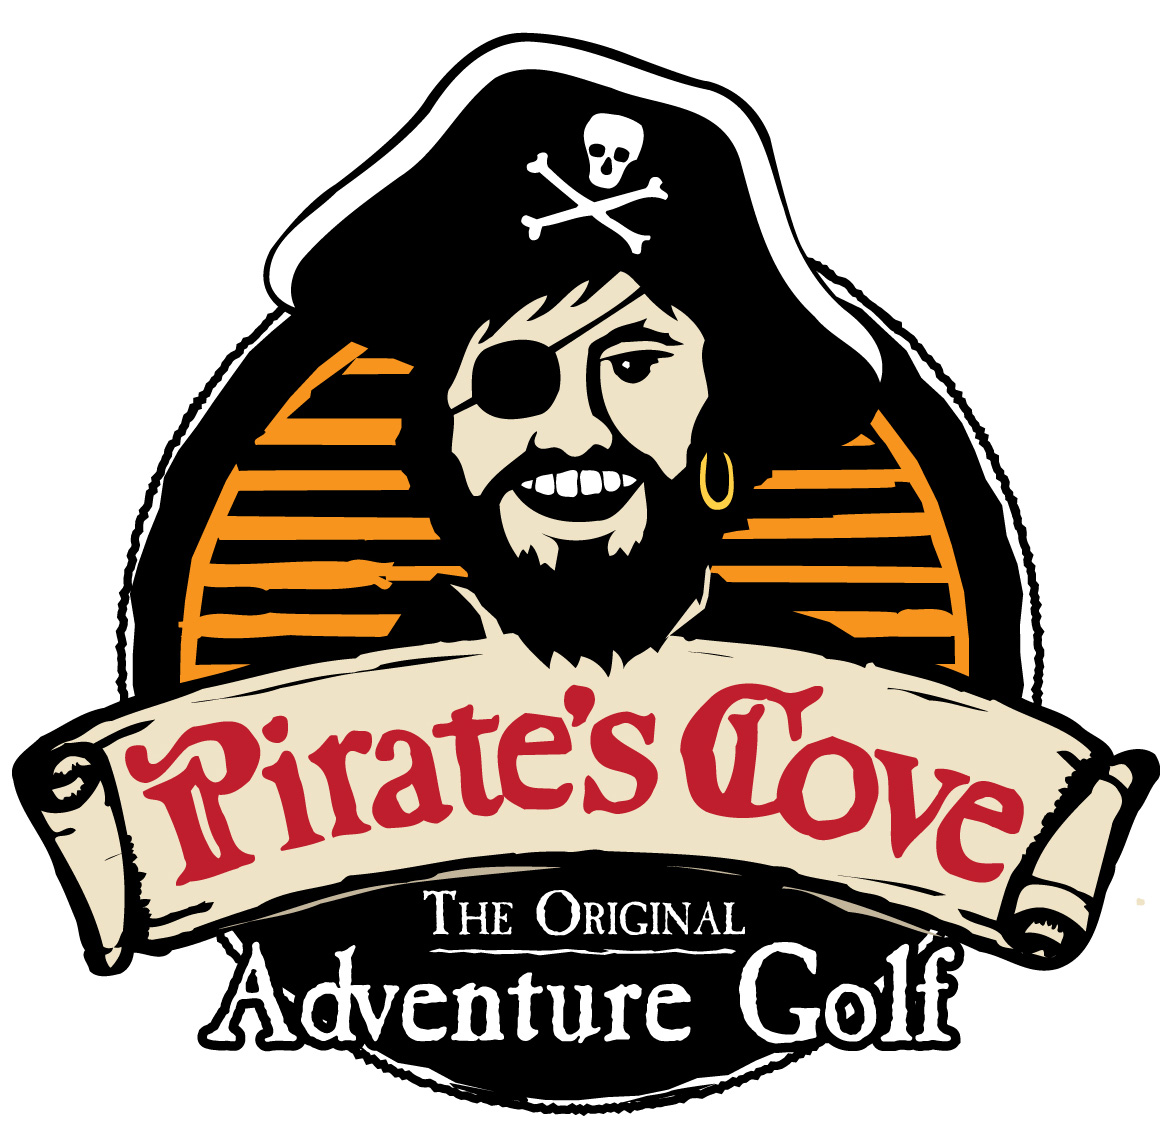 GMF- Pirates Cove Adventure Golf